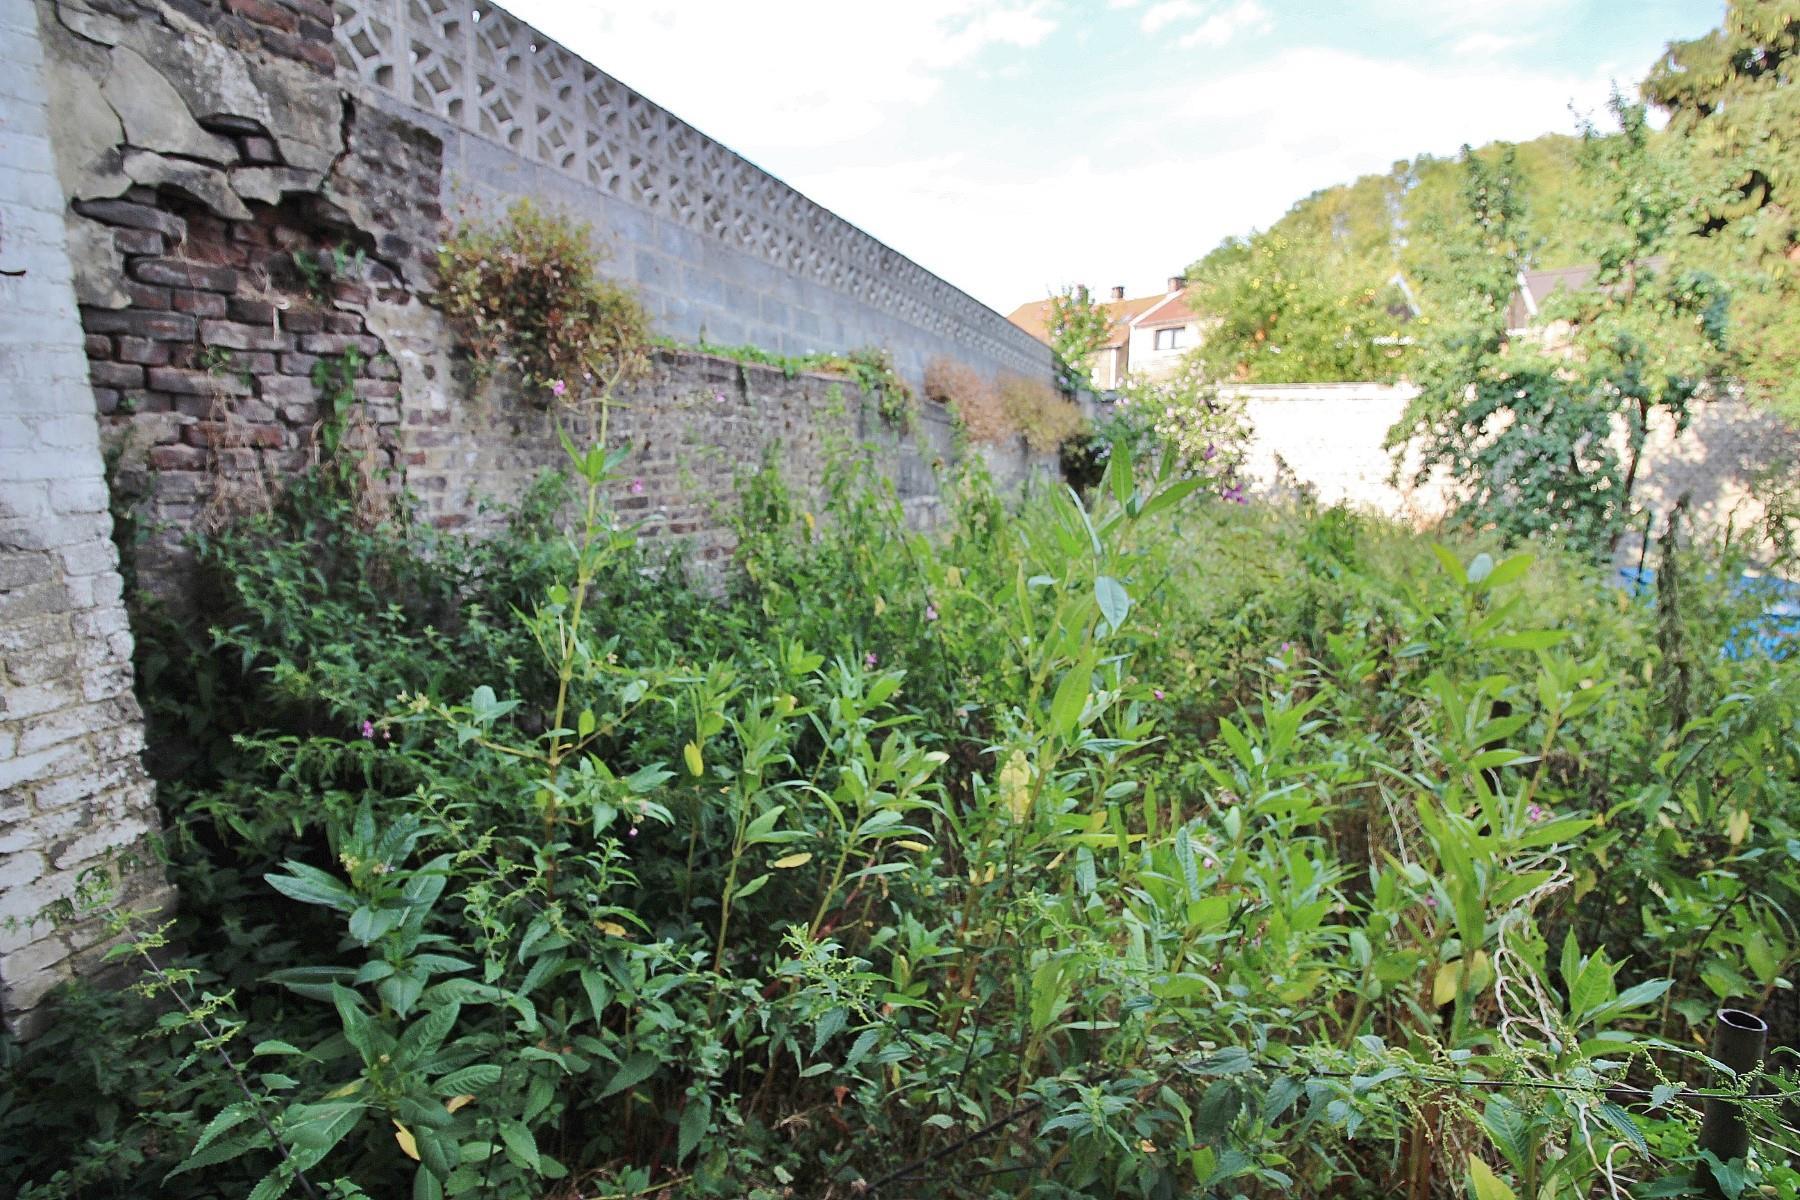 Maison - Seraing Jemeppesur-Meuse - #3539725-8